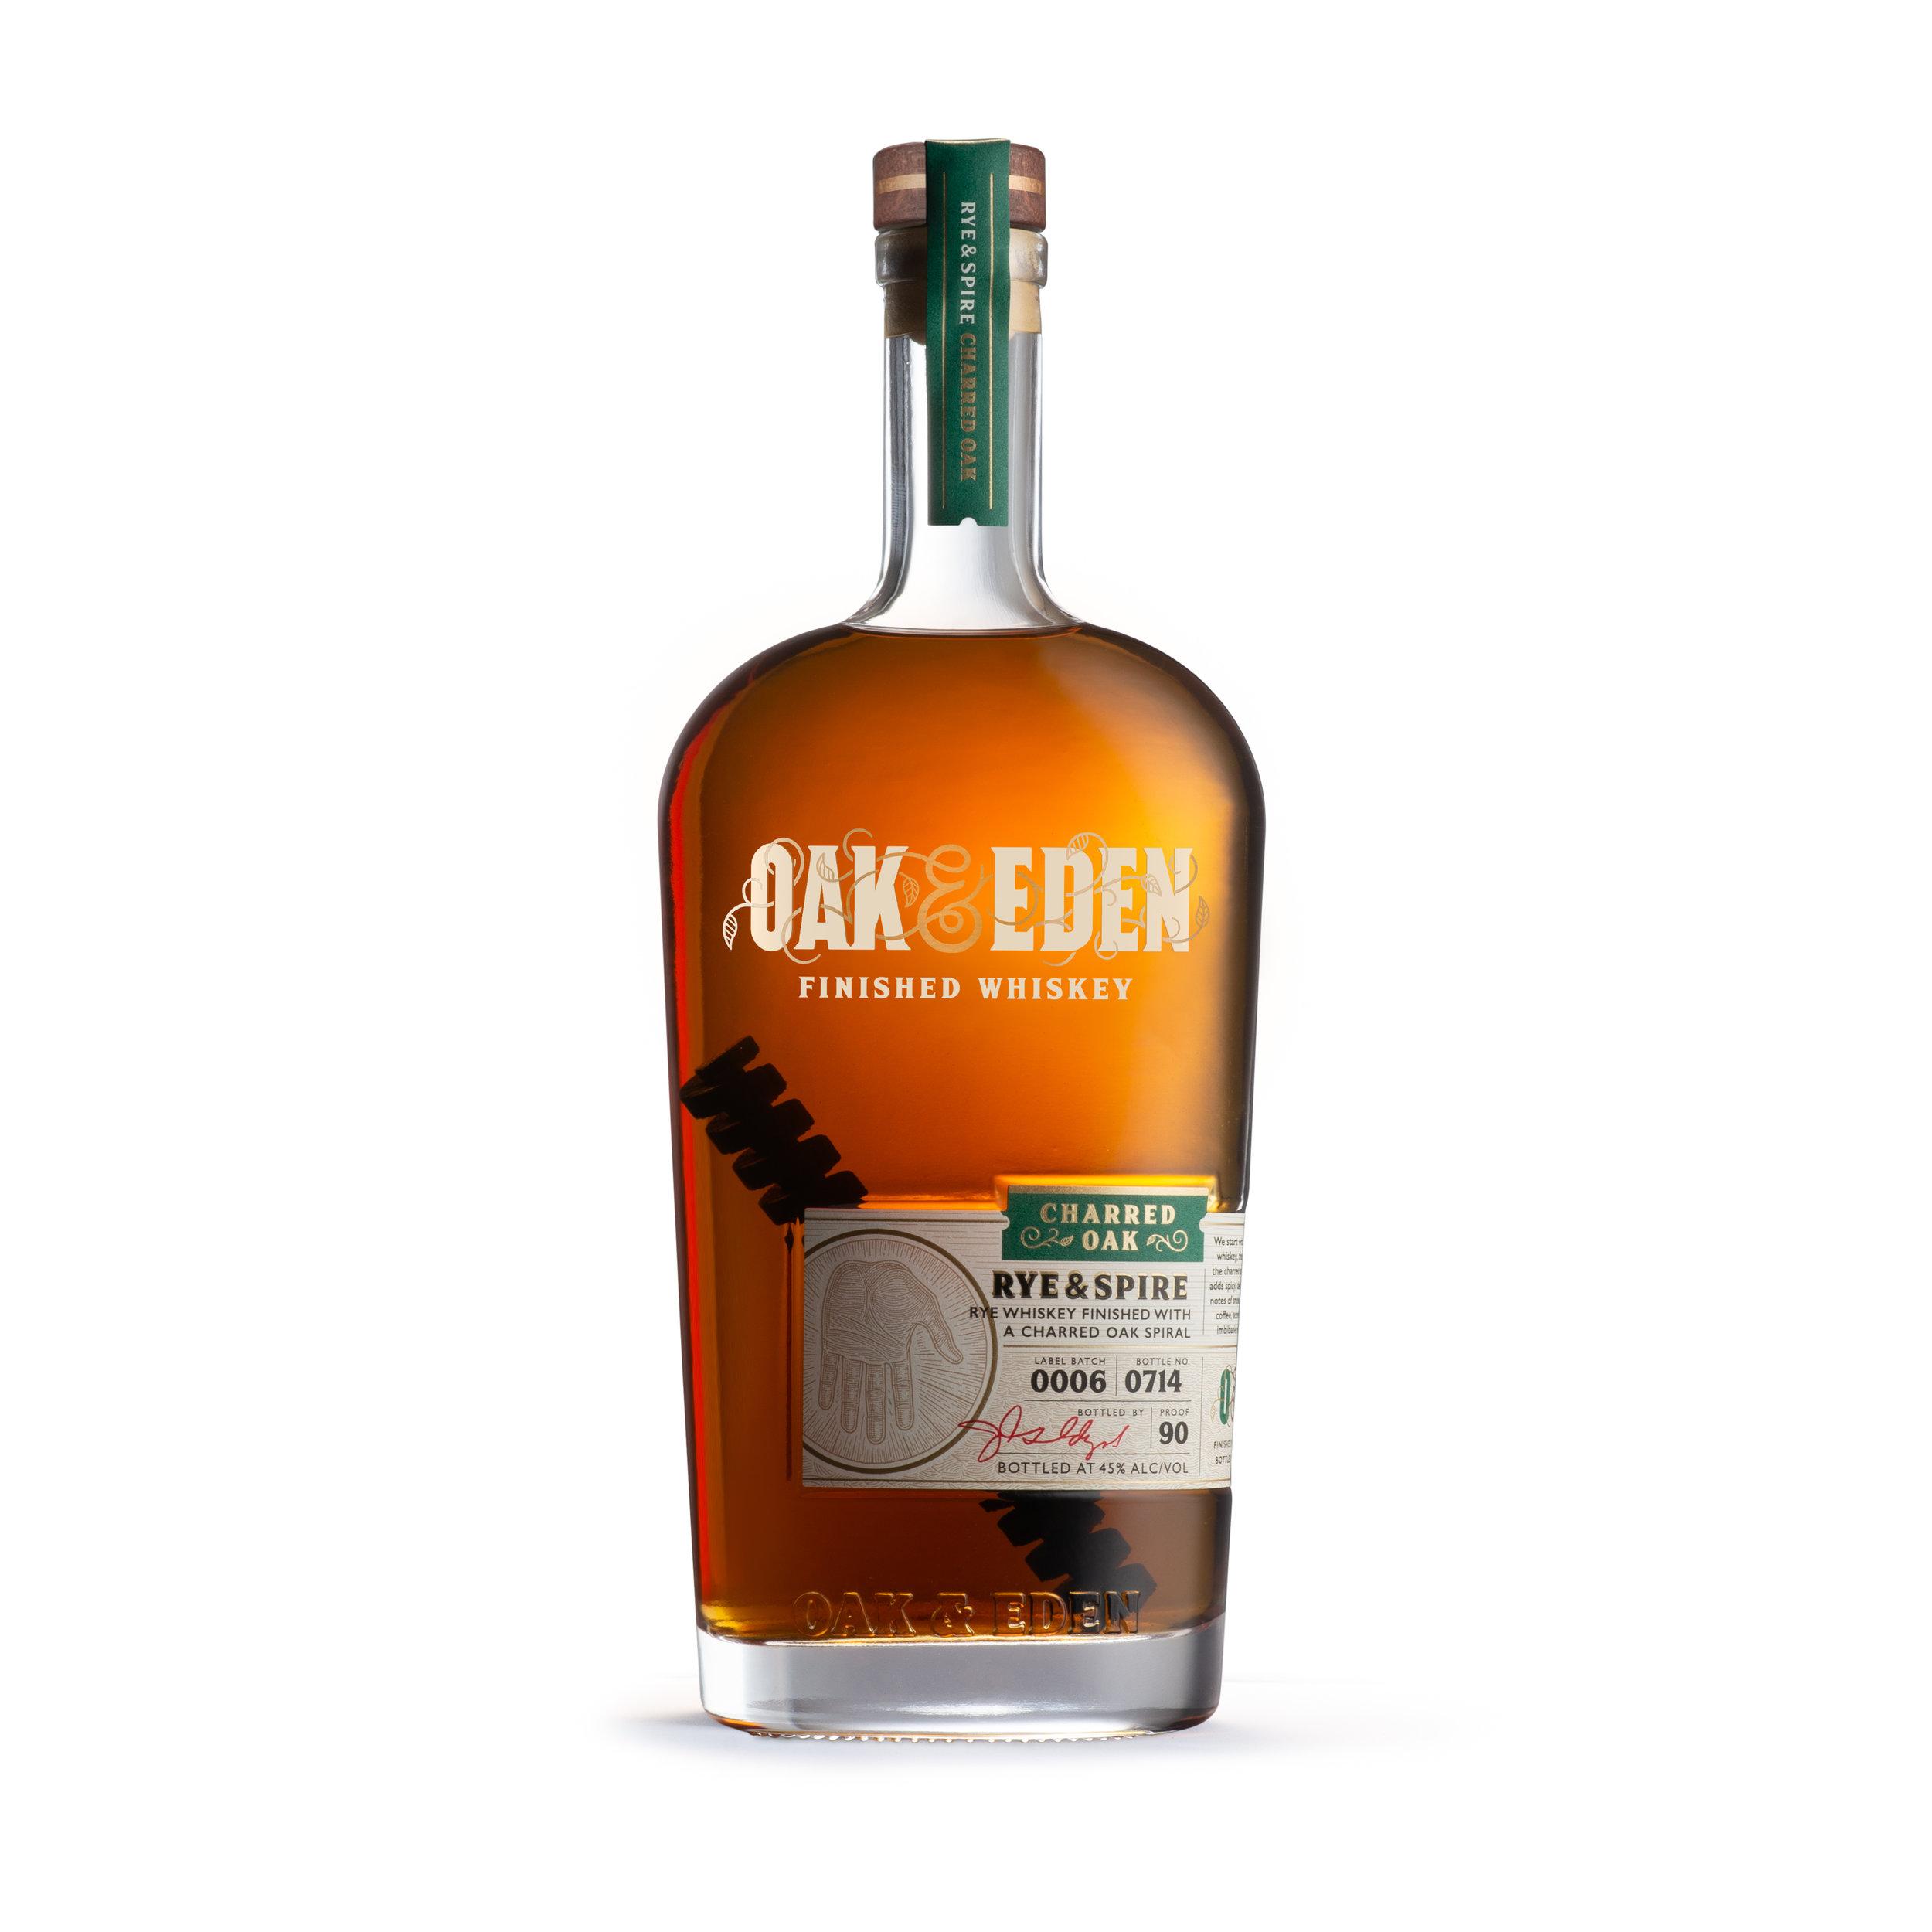 OAK-AND-EDEN-FINALS-004.jpg